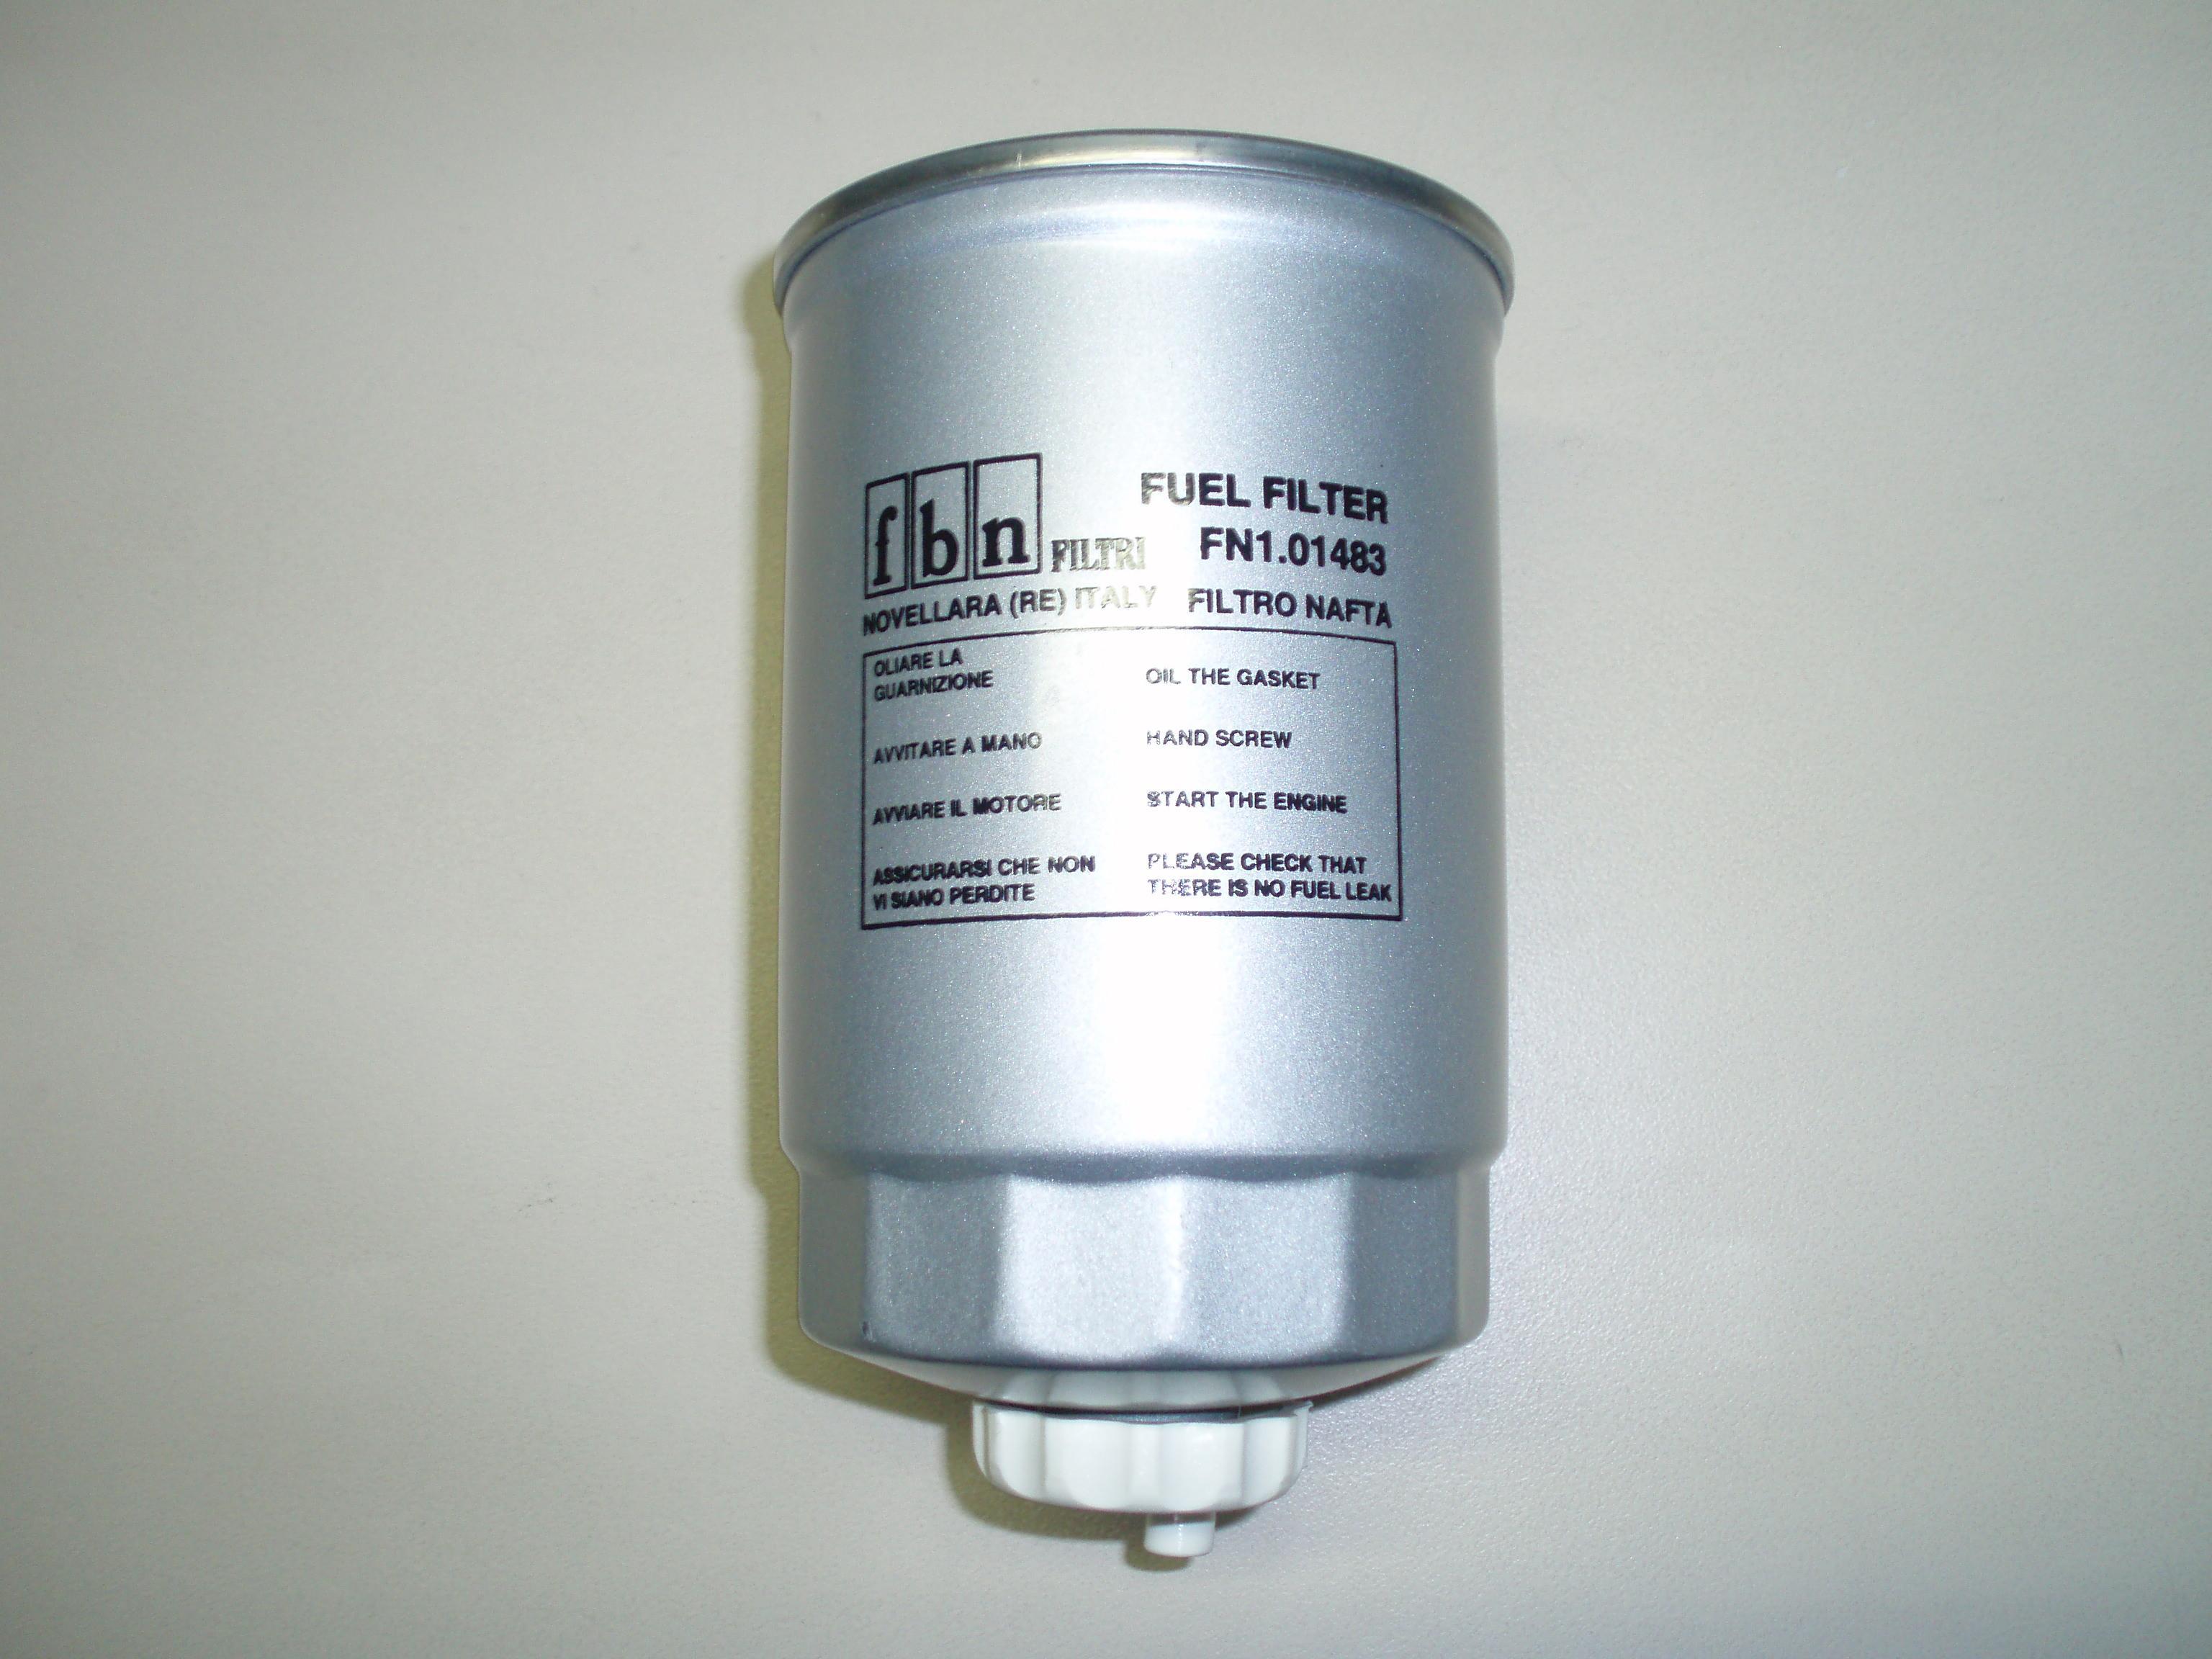 Filtre Gasoil Chd Ldw1603 Ldw2204 Focs Ldw903 Ldw1003 Lombardini Fn1 Fuel Filter Fn101483 2175143 2175299 Vm Motori 45310071a